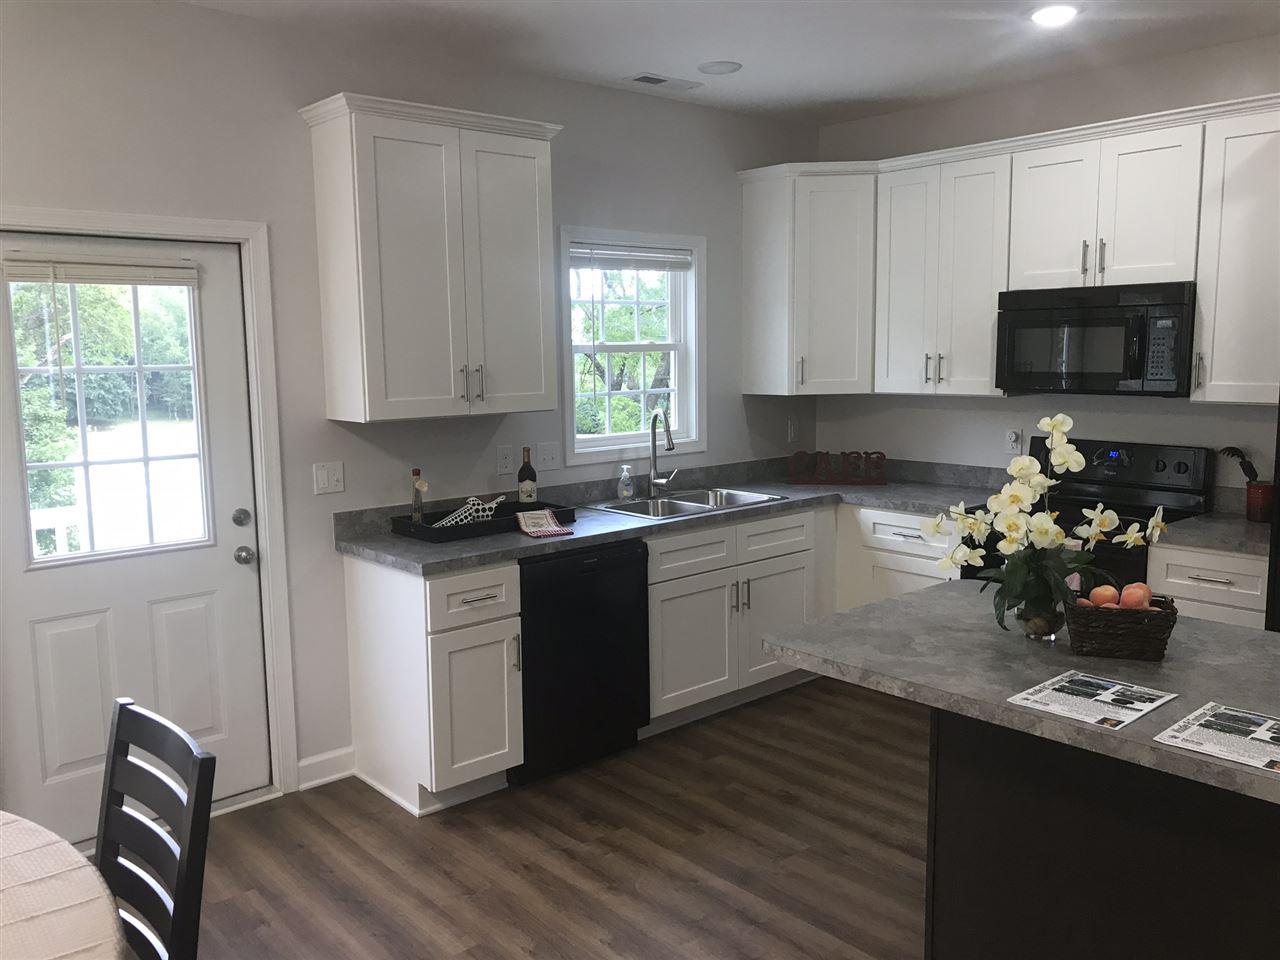 61A Woodlee Rd, Staunton, VA, 24401